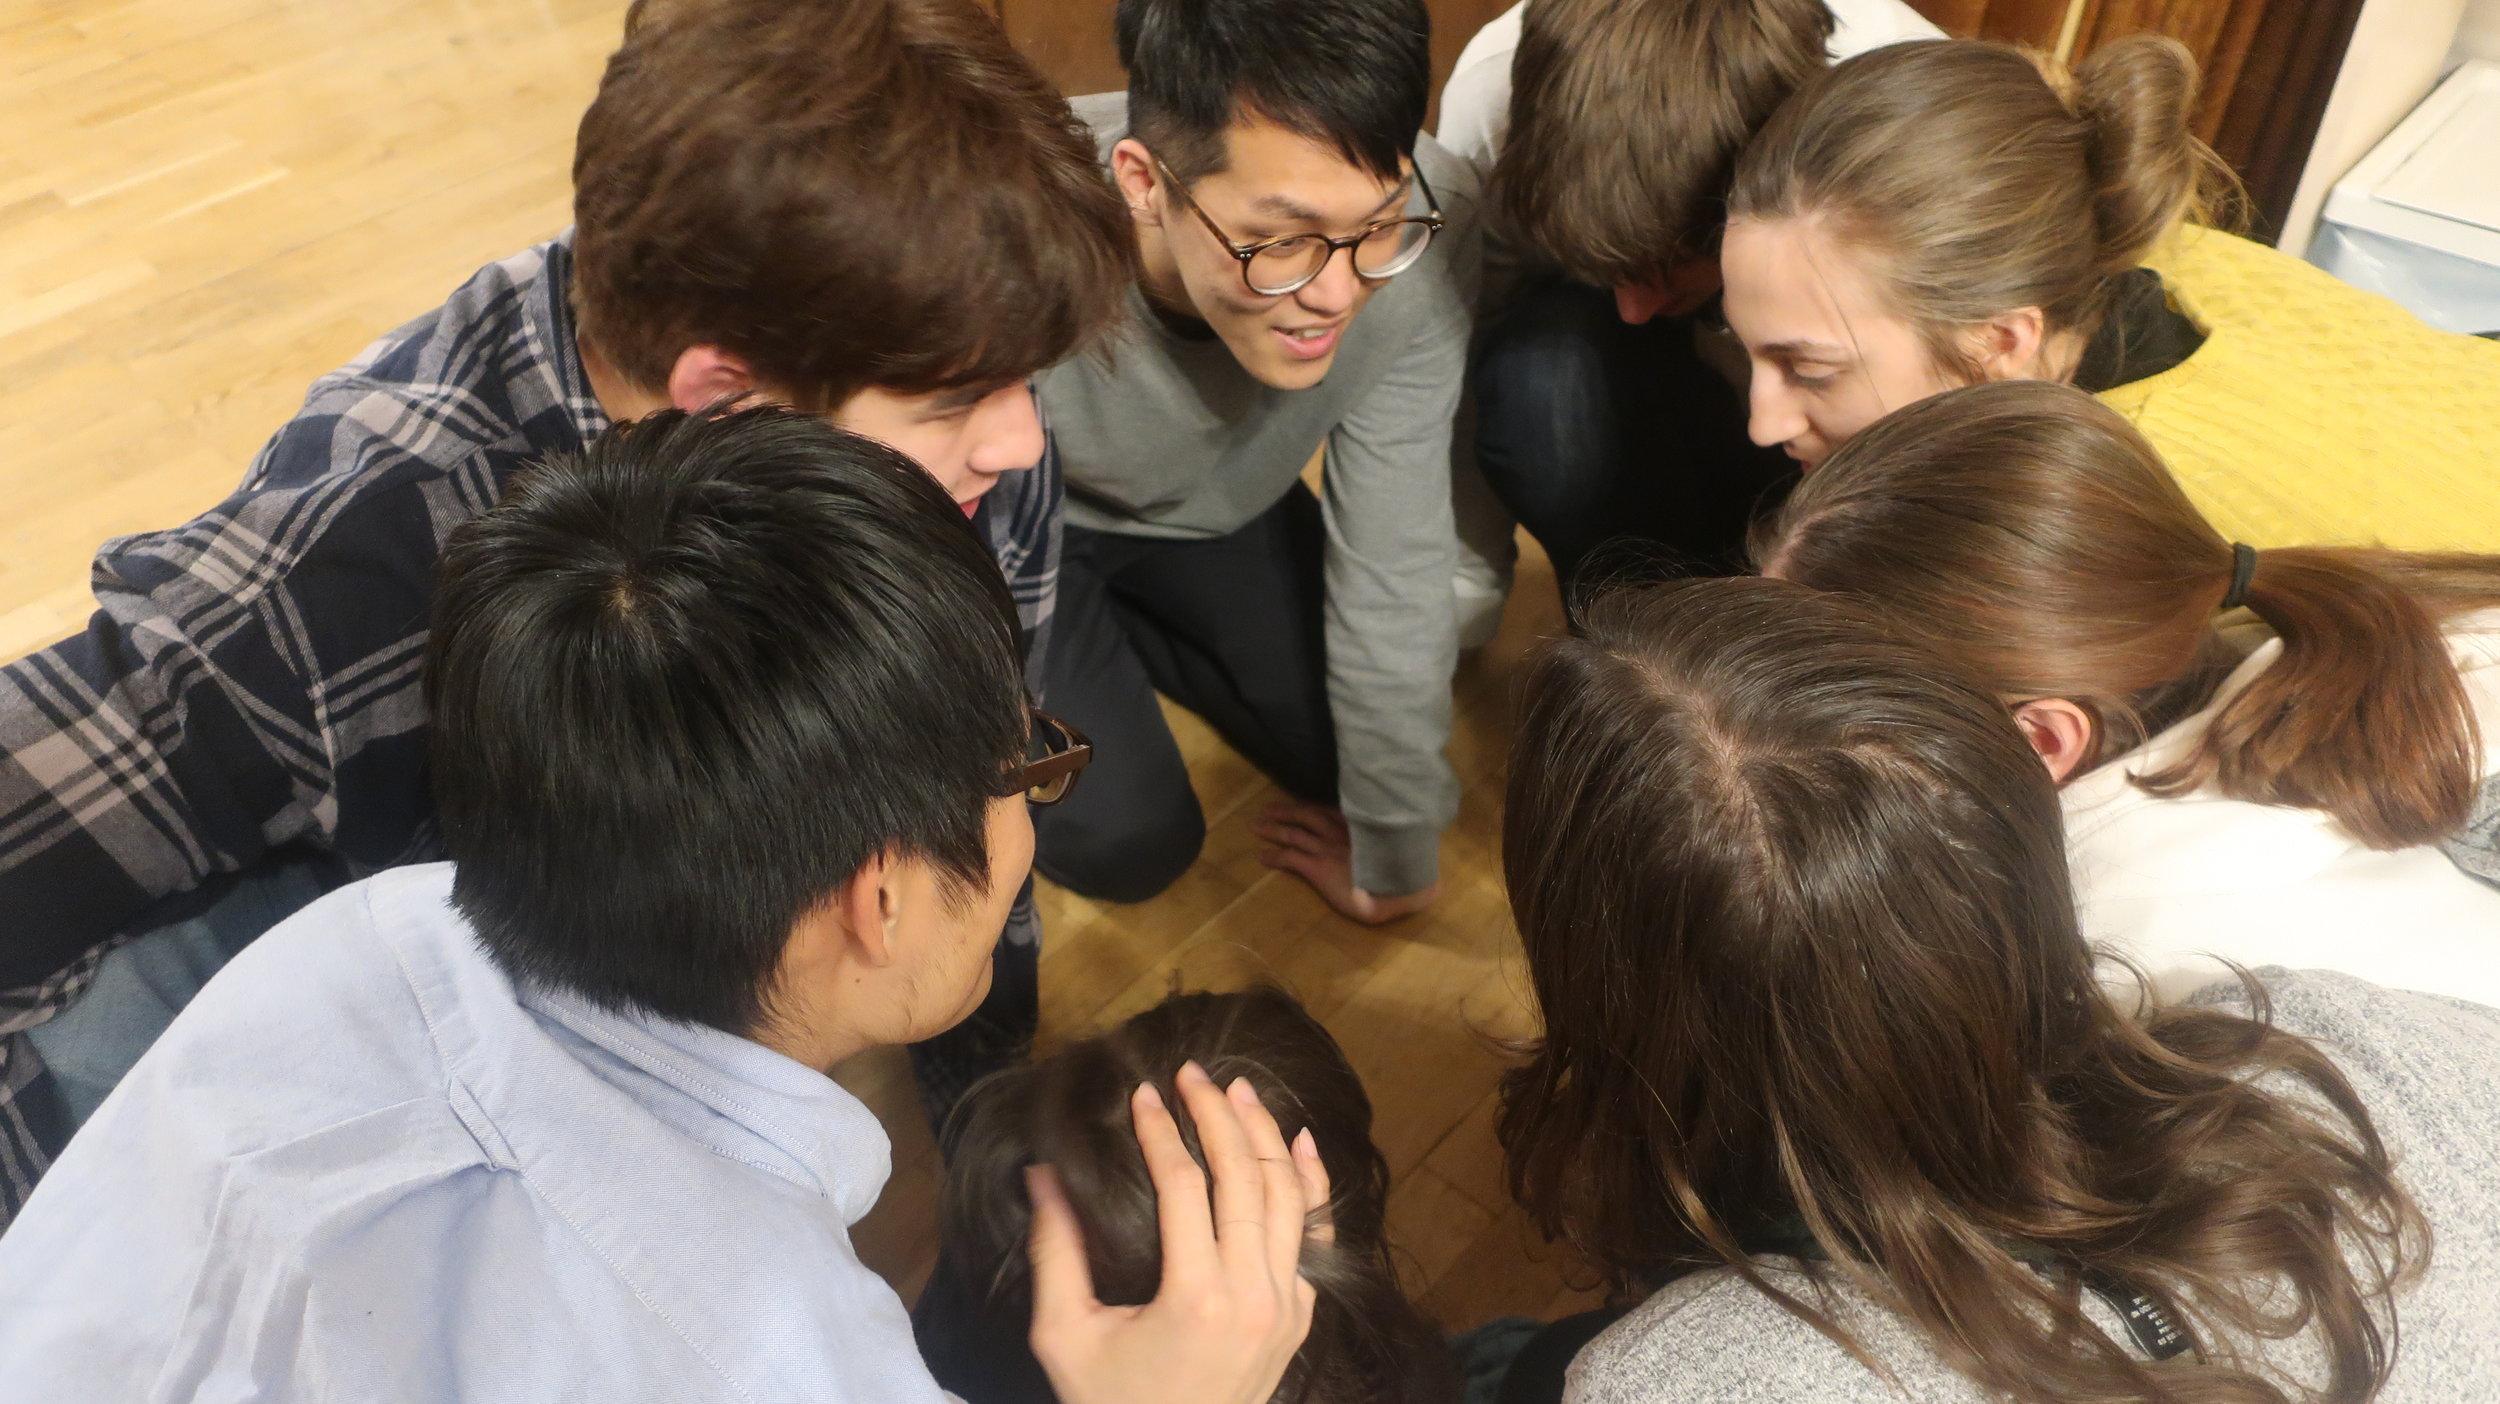 Group bonding activity